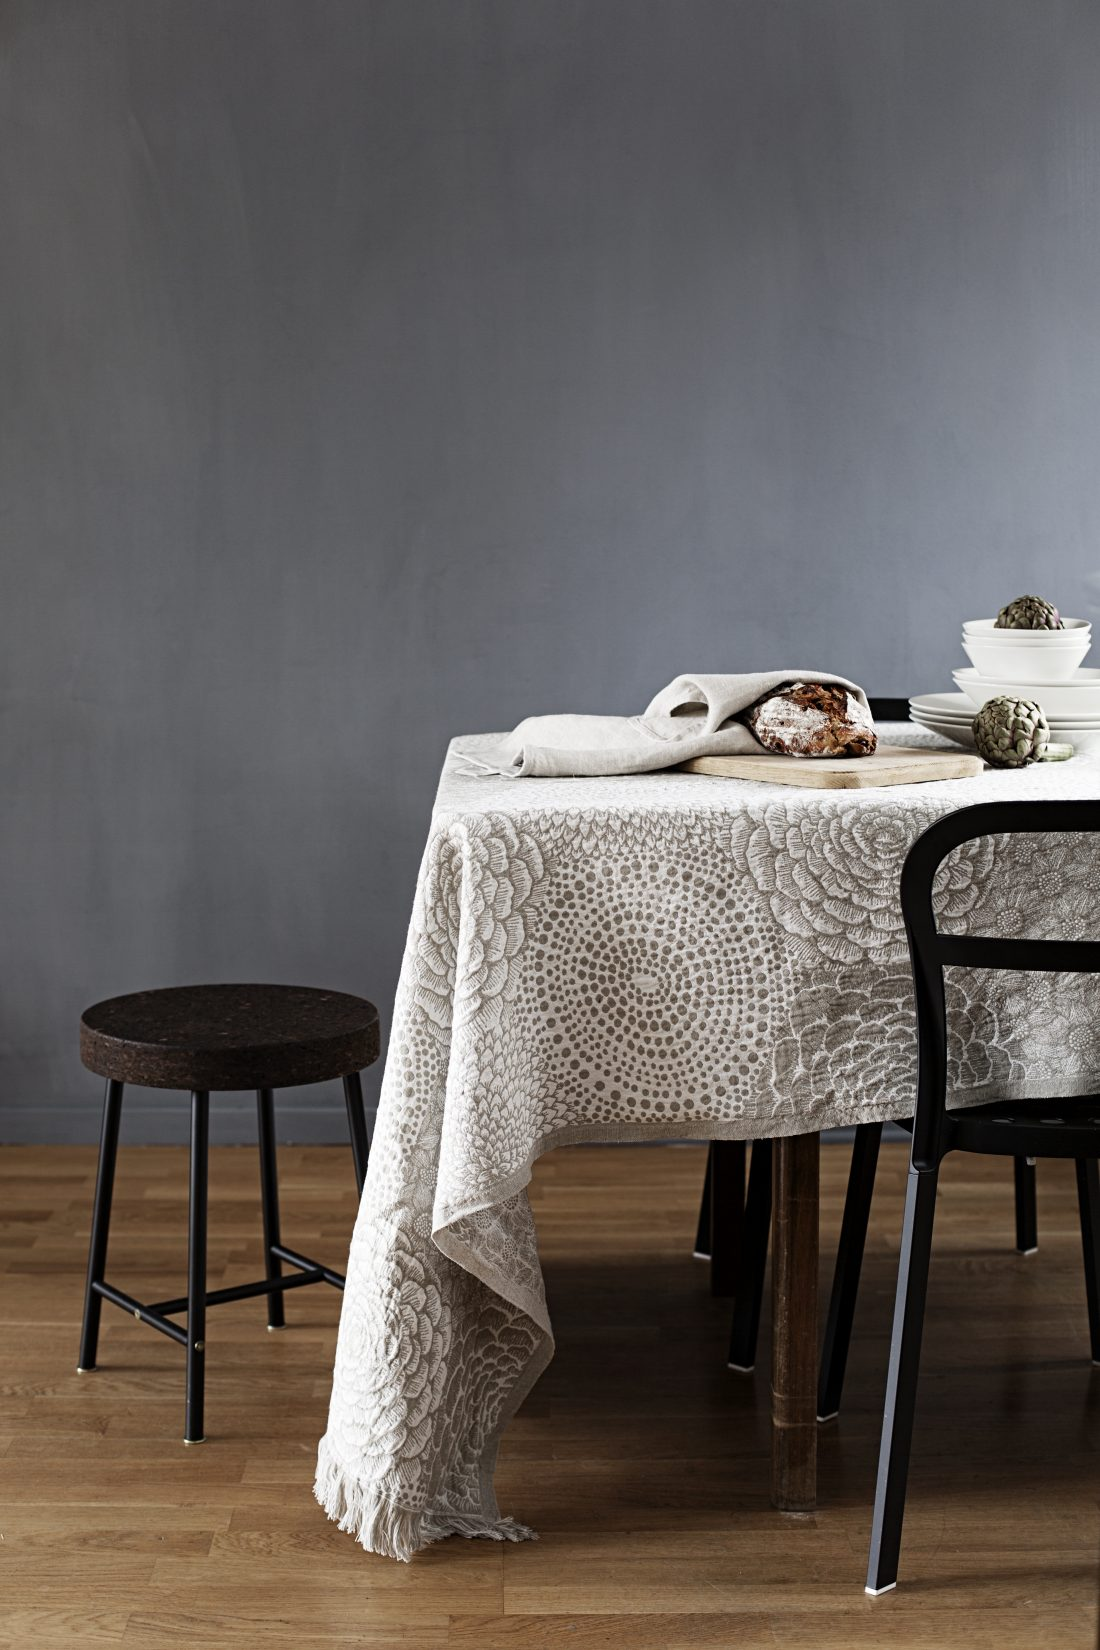 Katinka Kreative linen tablecloth sustainable design